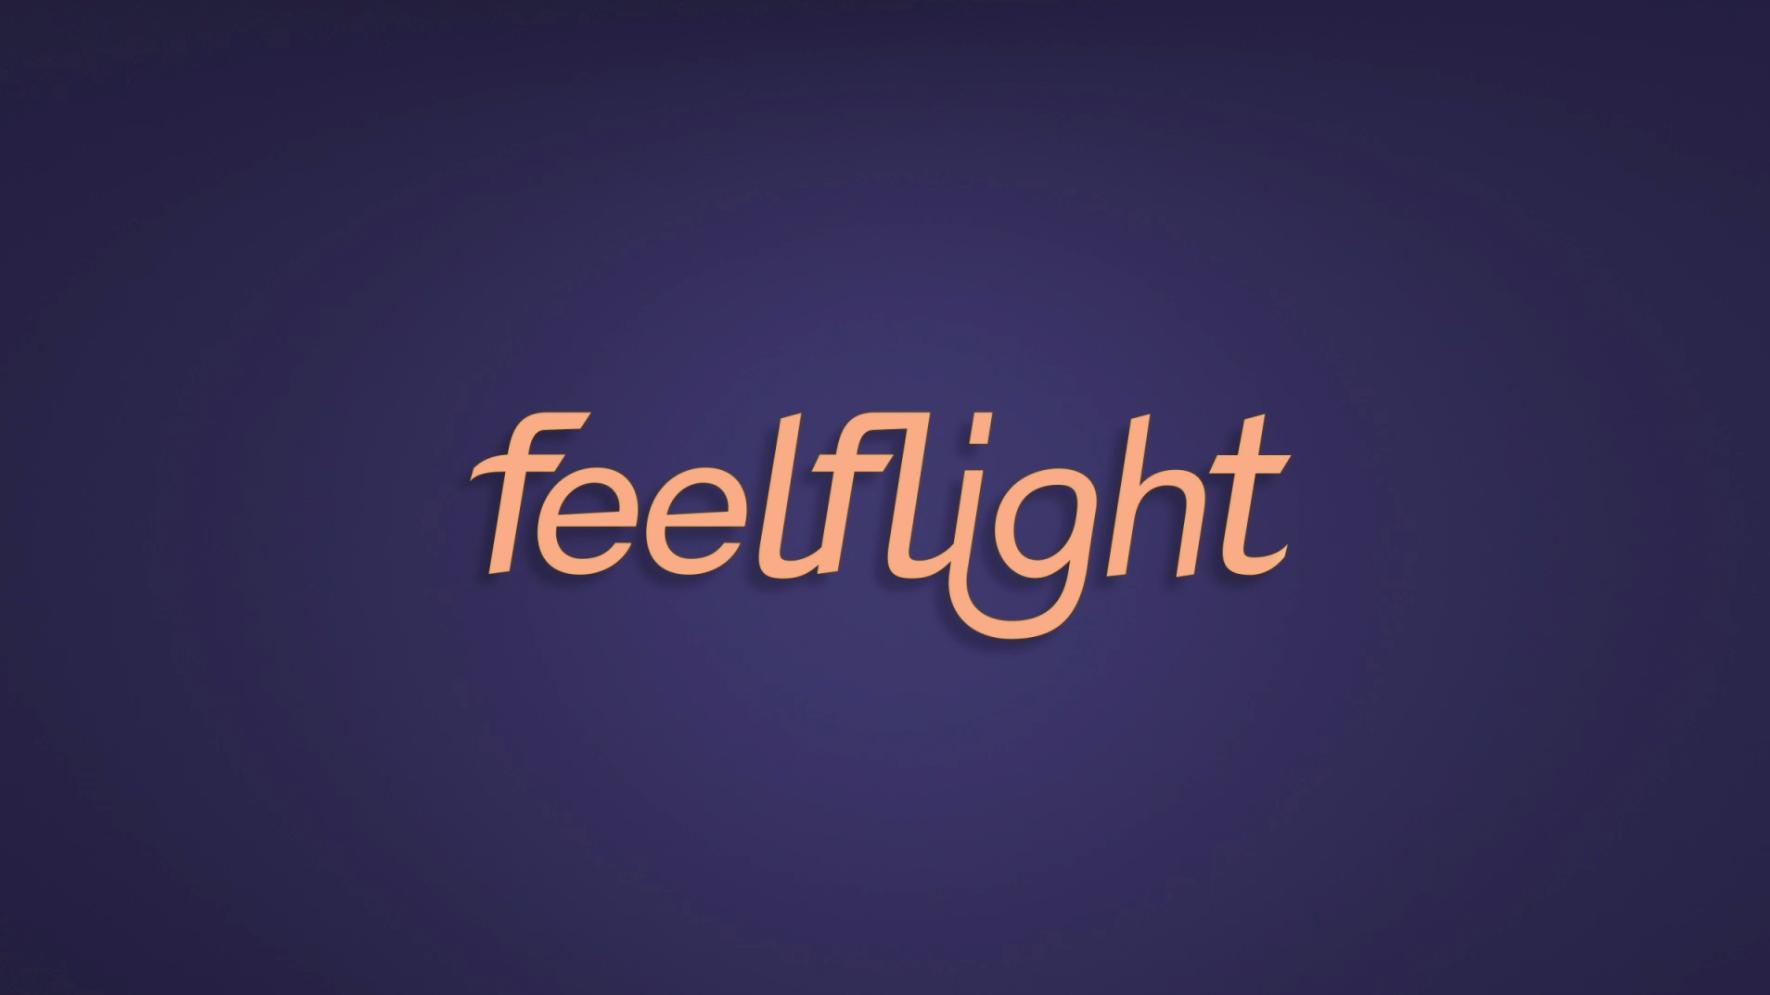 Feelflight